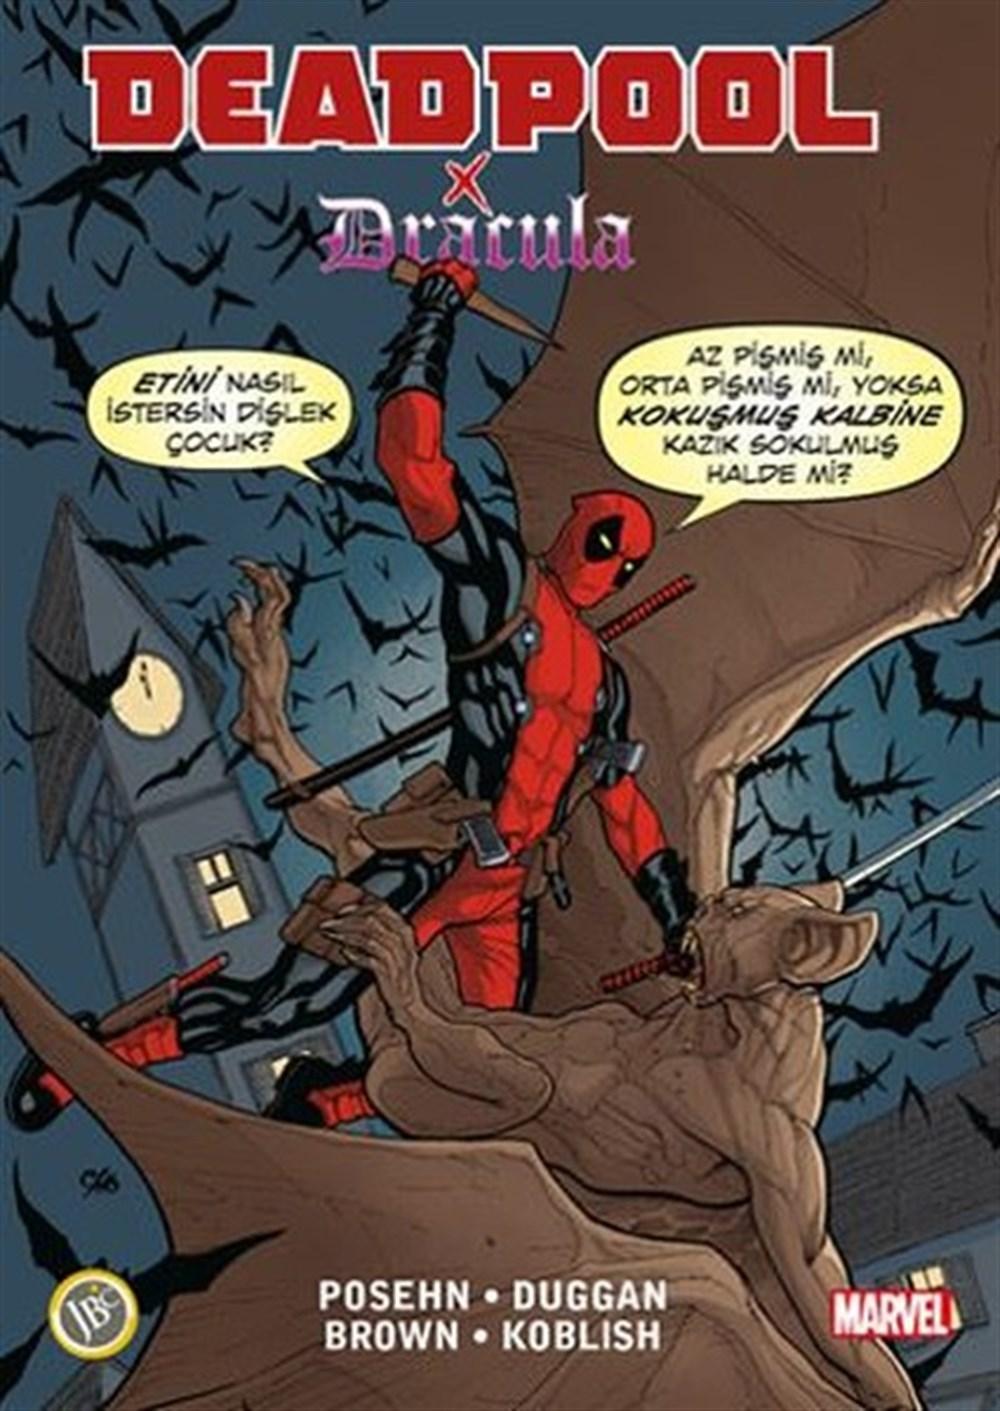 Deadpool - Dracula